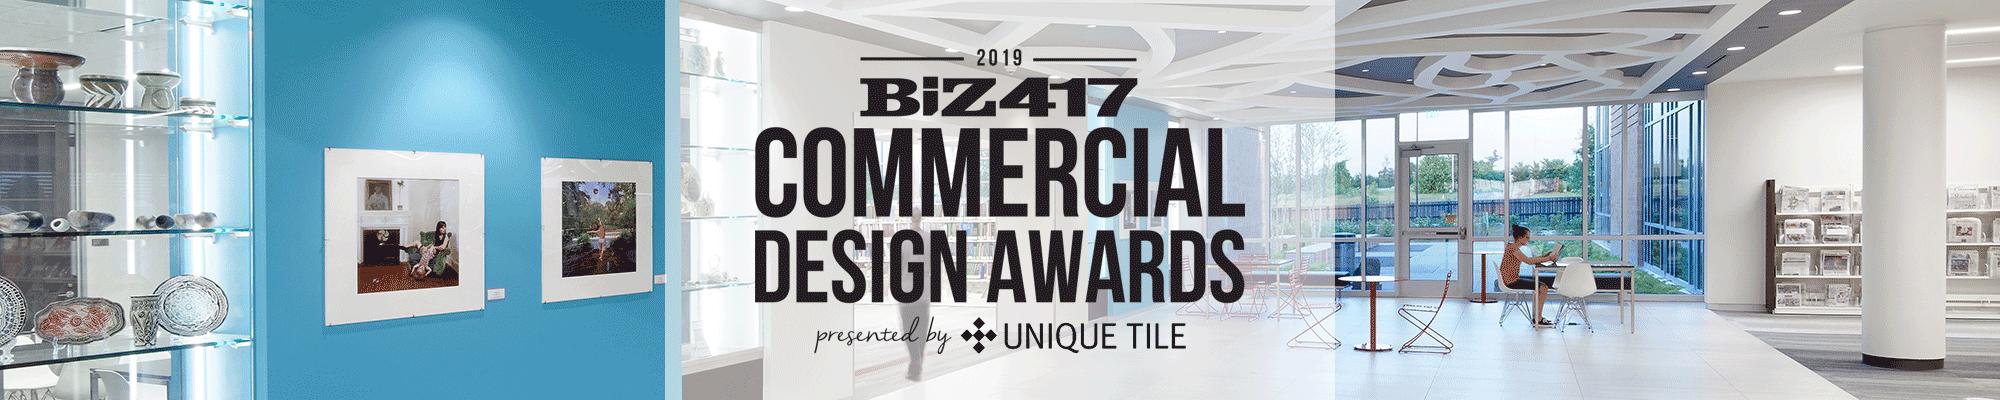 Biz 417 Commercial Design Awards Nominations